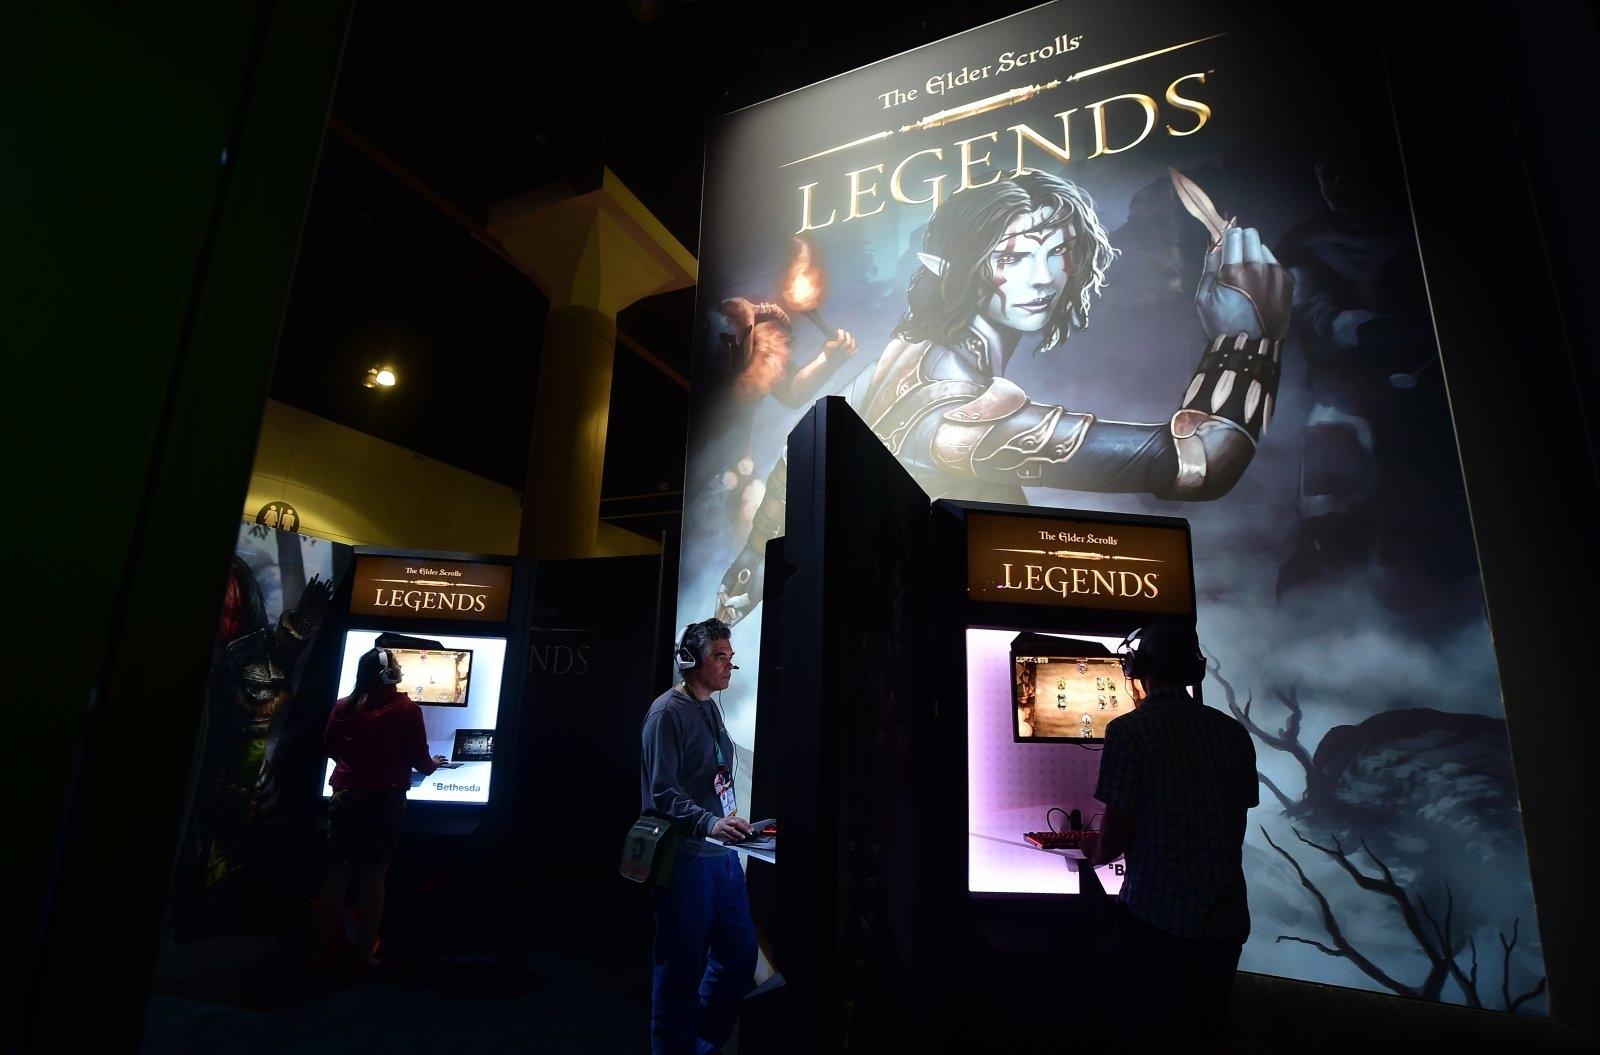 احتمال منتشر نشدن The Elder Scrolls: Legends برای کنسول PS4